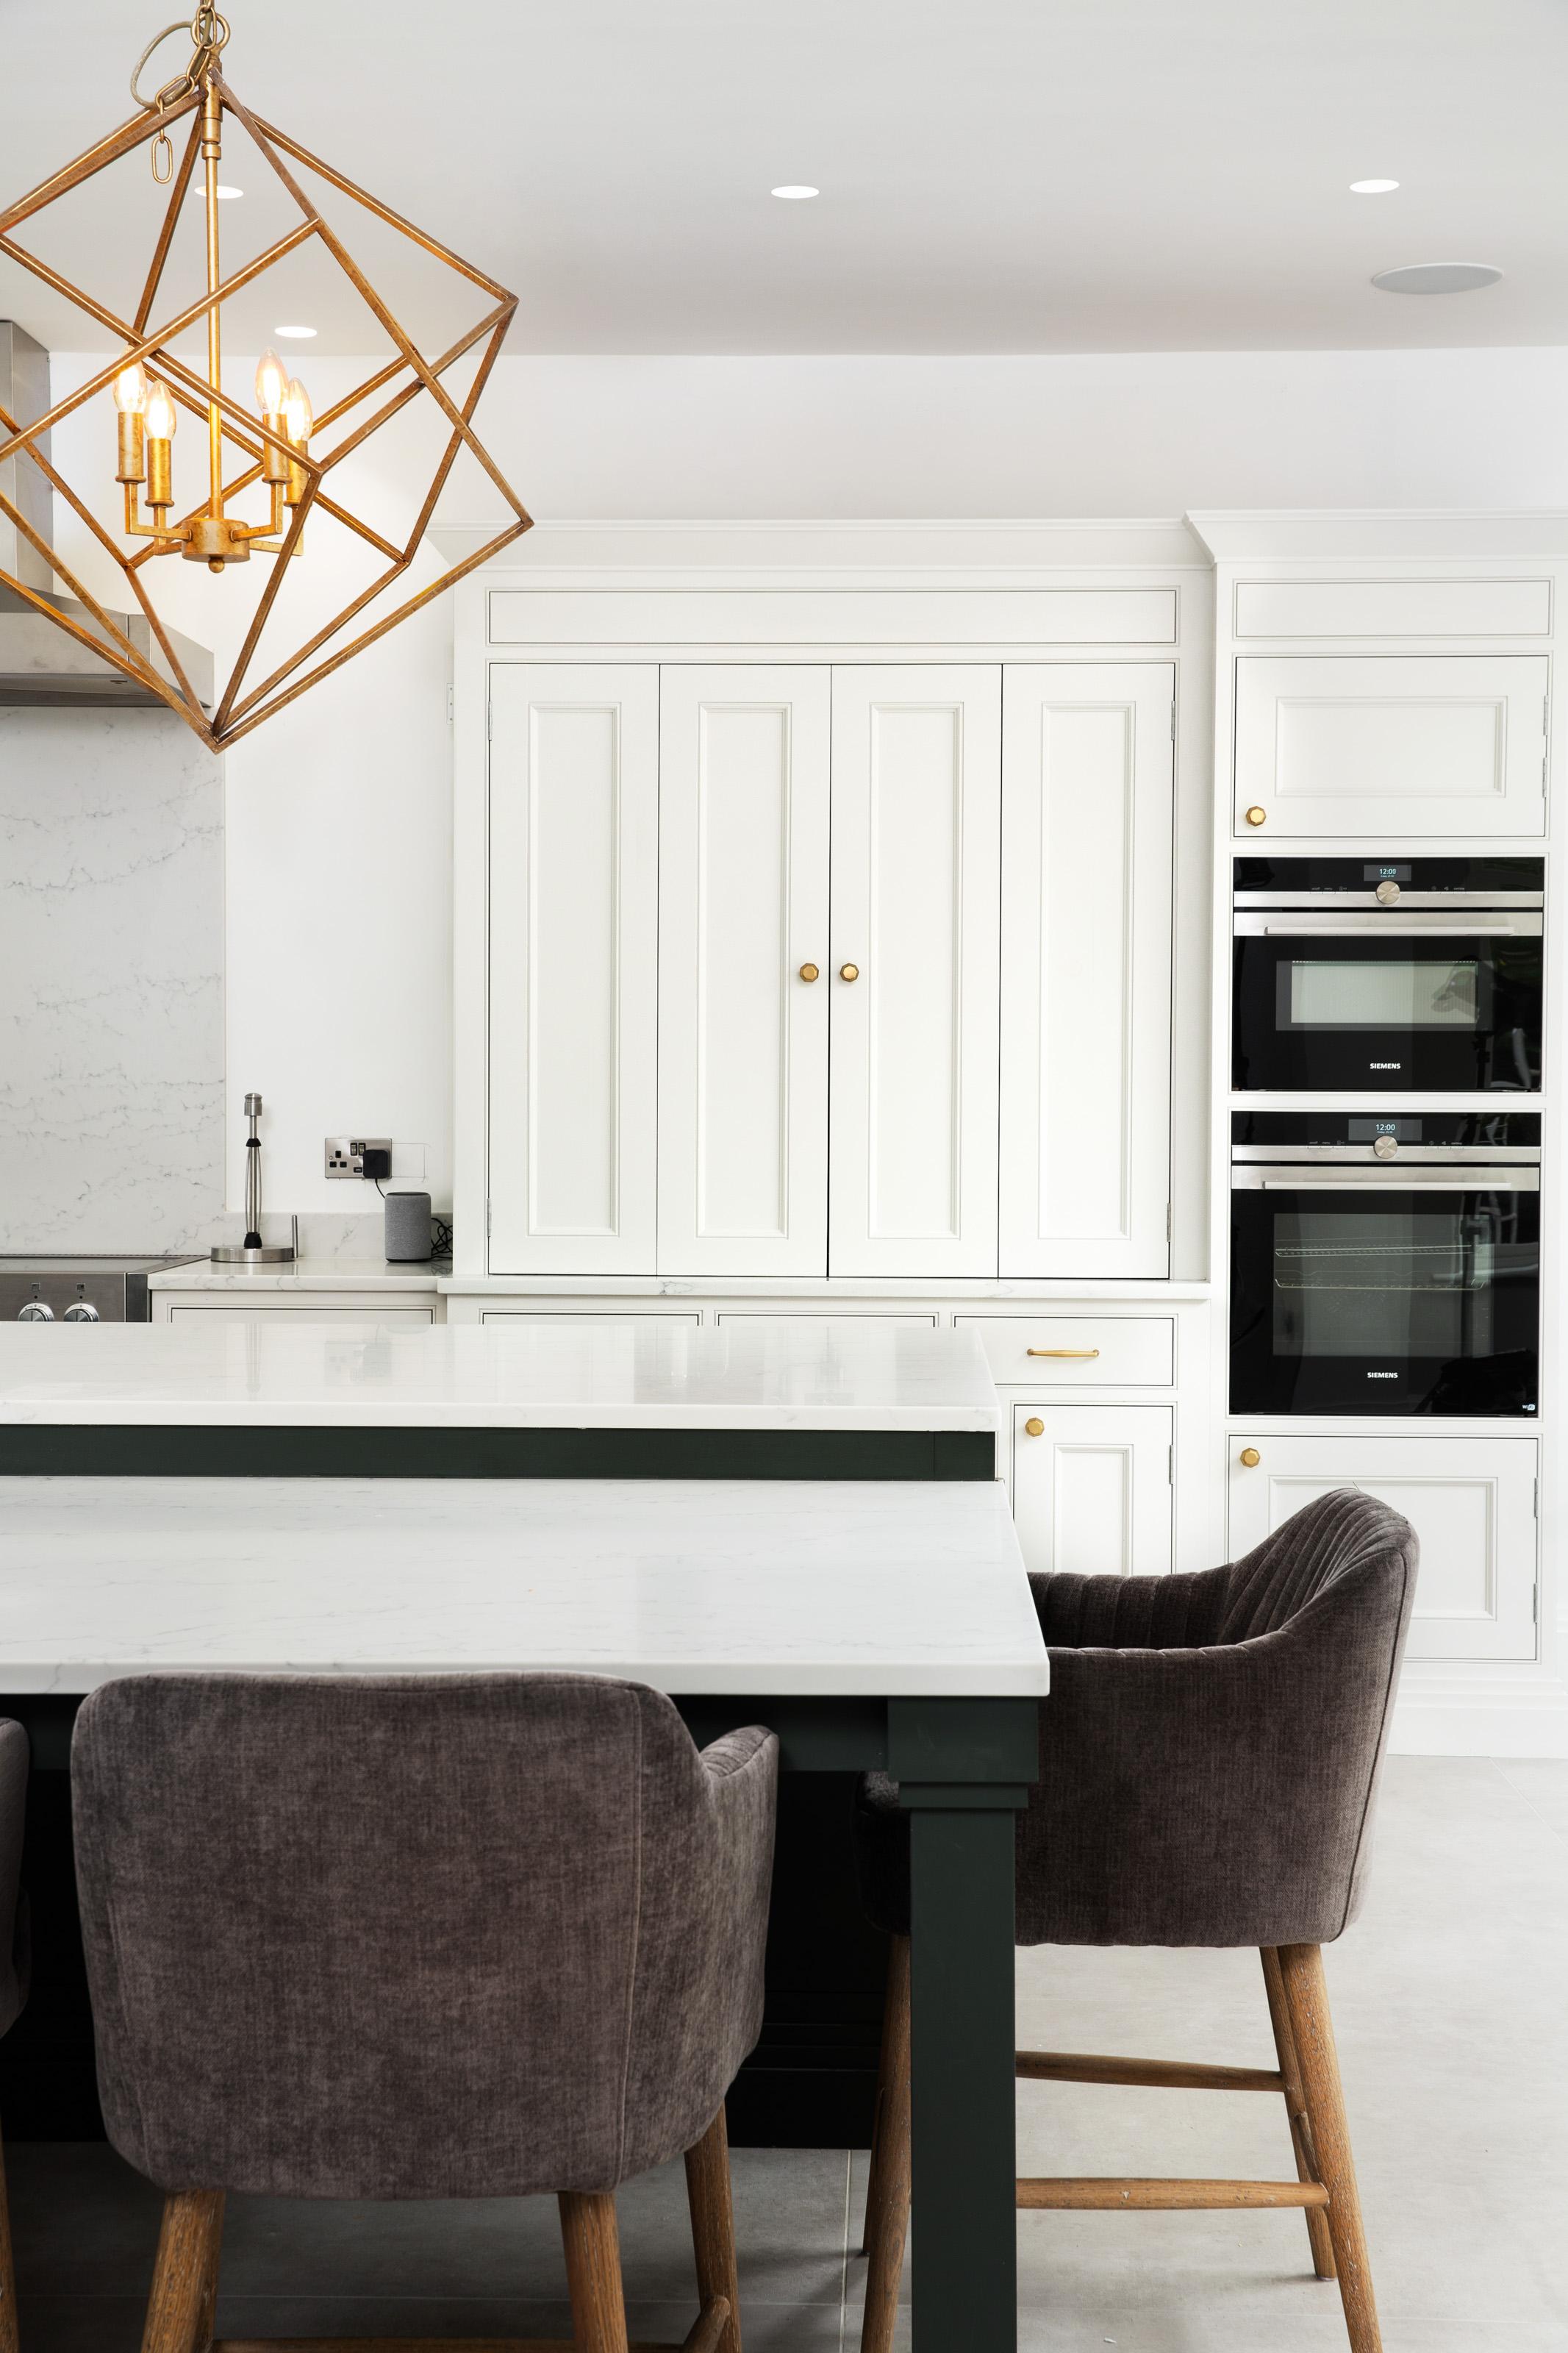 Watsons_Kitchens_Harrogate-8-1